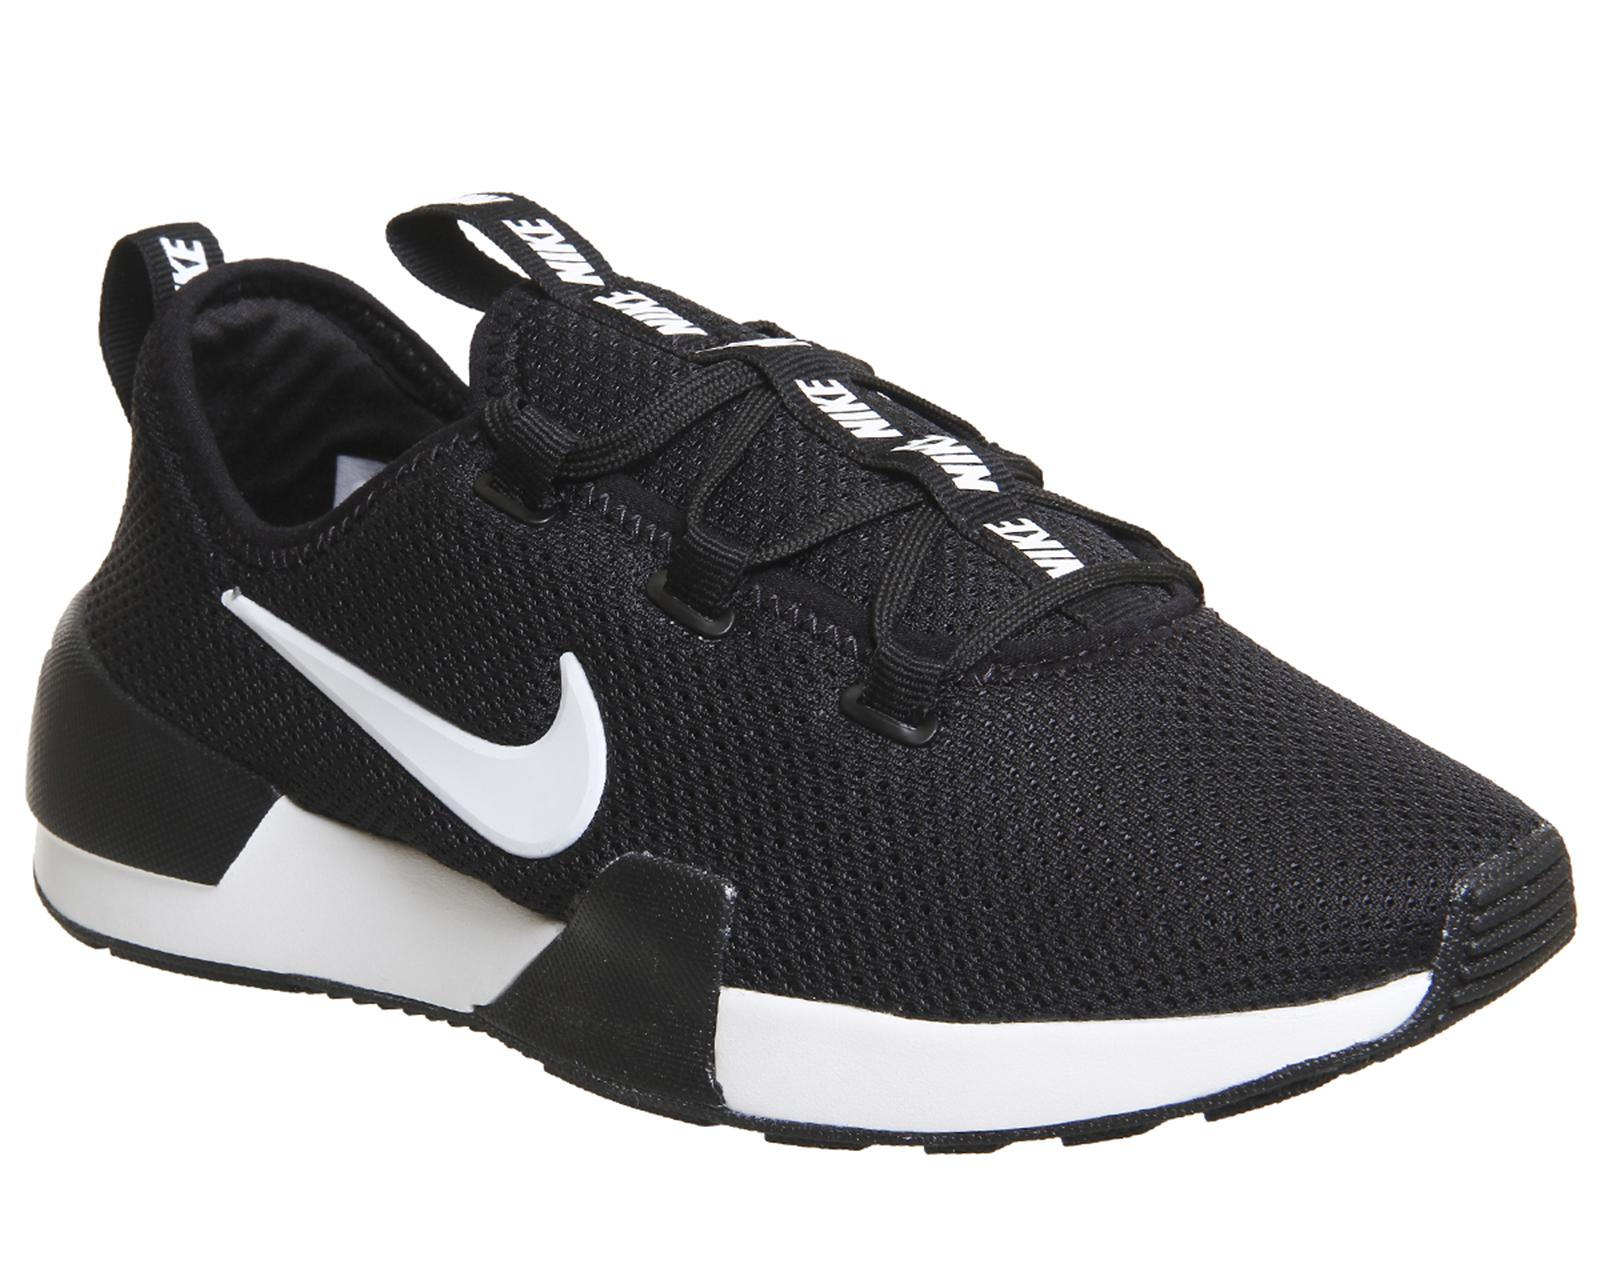 Nike Rubber Ashin Trainers in Black